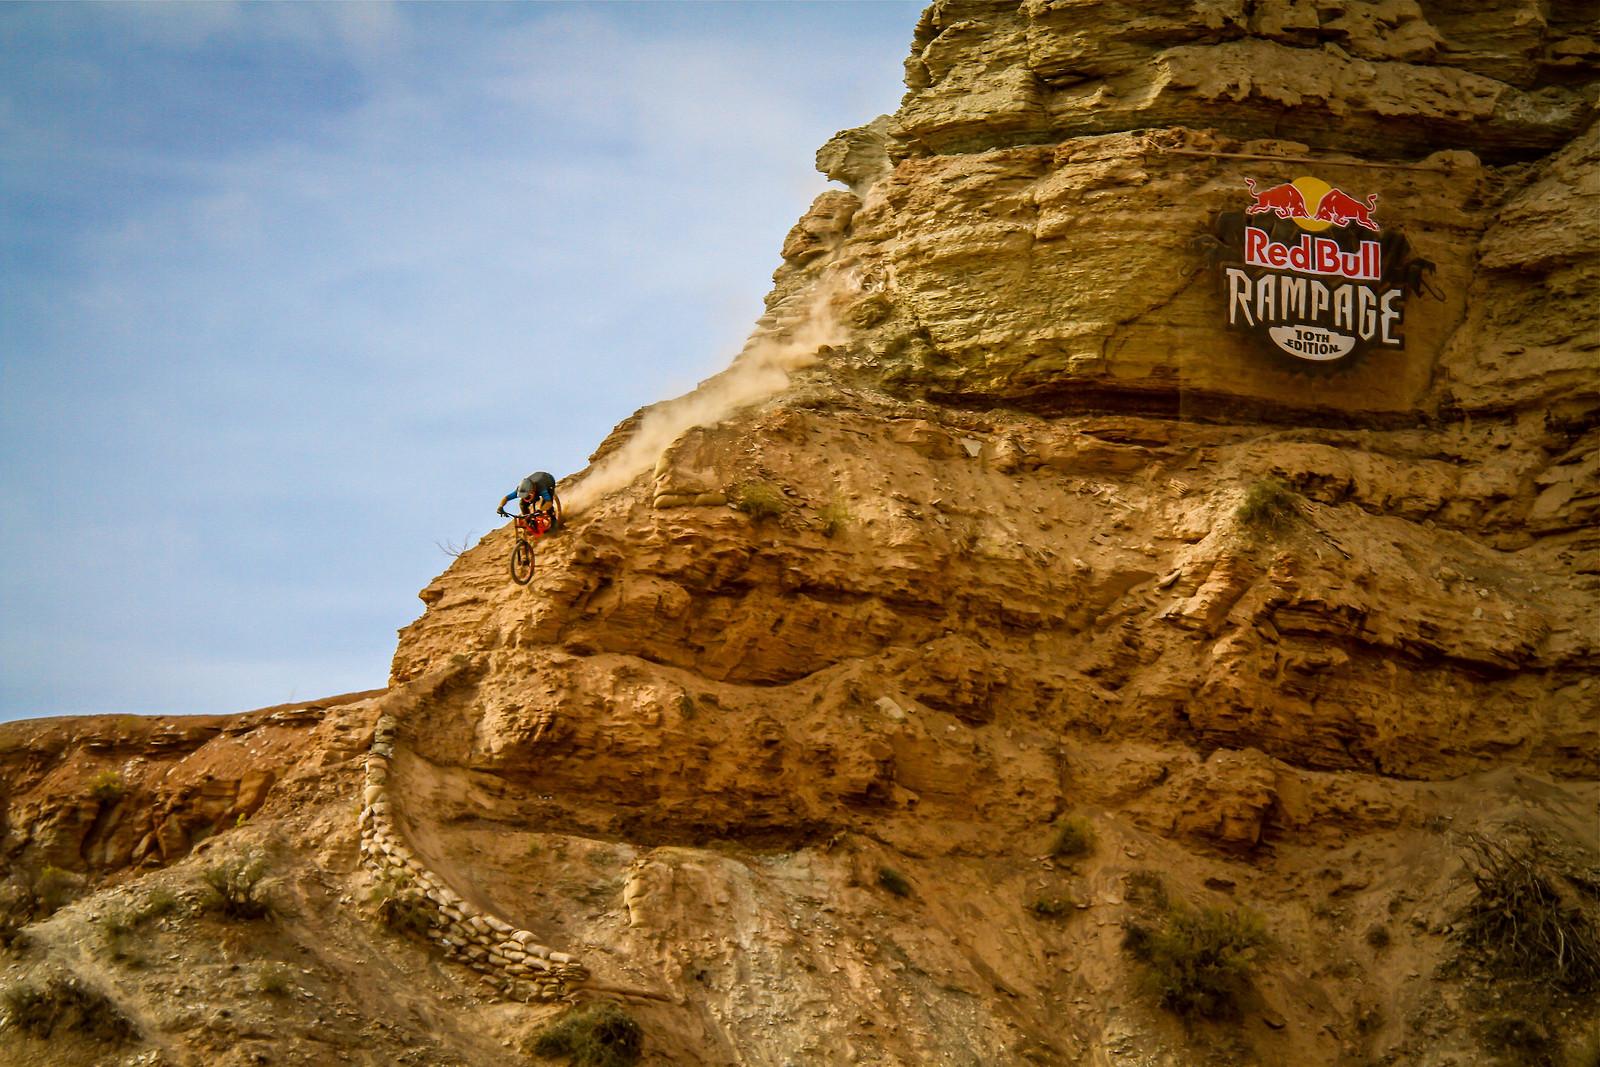 Paul B 2015 (1 of 1) - Malcolm Mclaws - Mountain Biking Pictures - Vital MTB